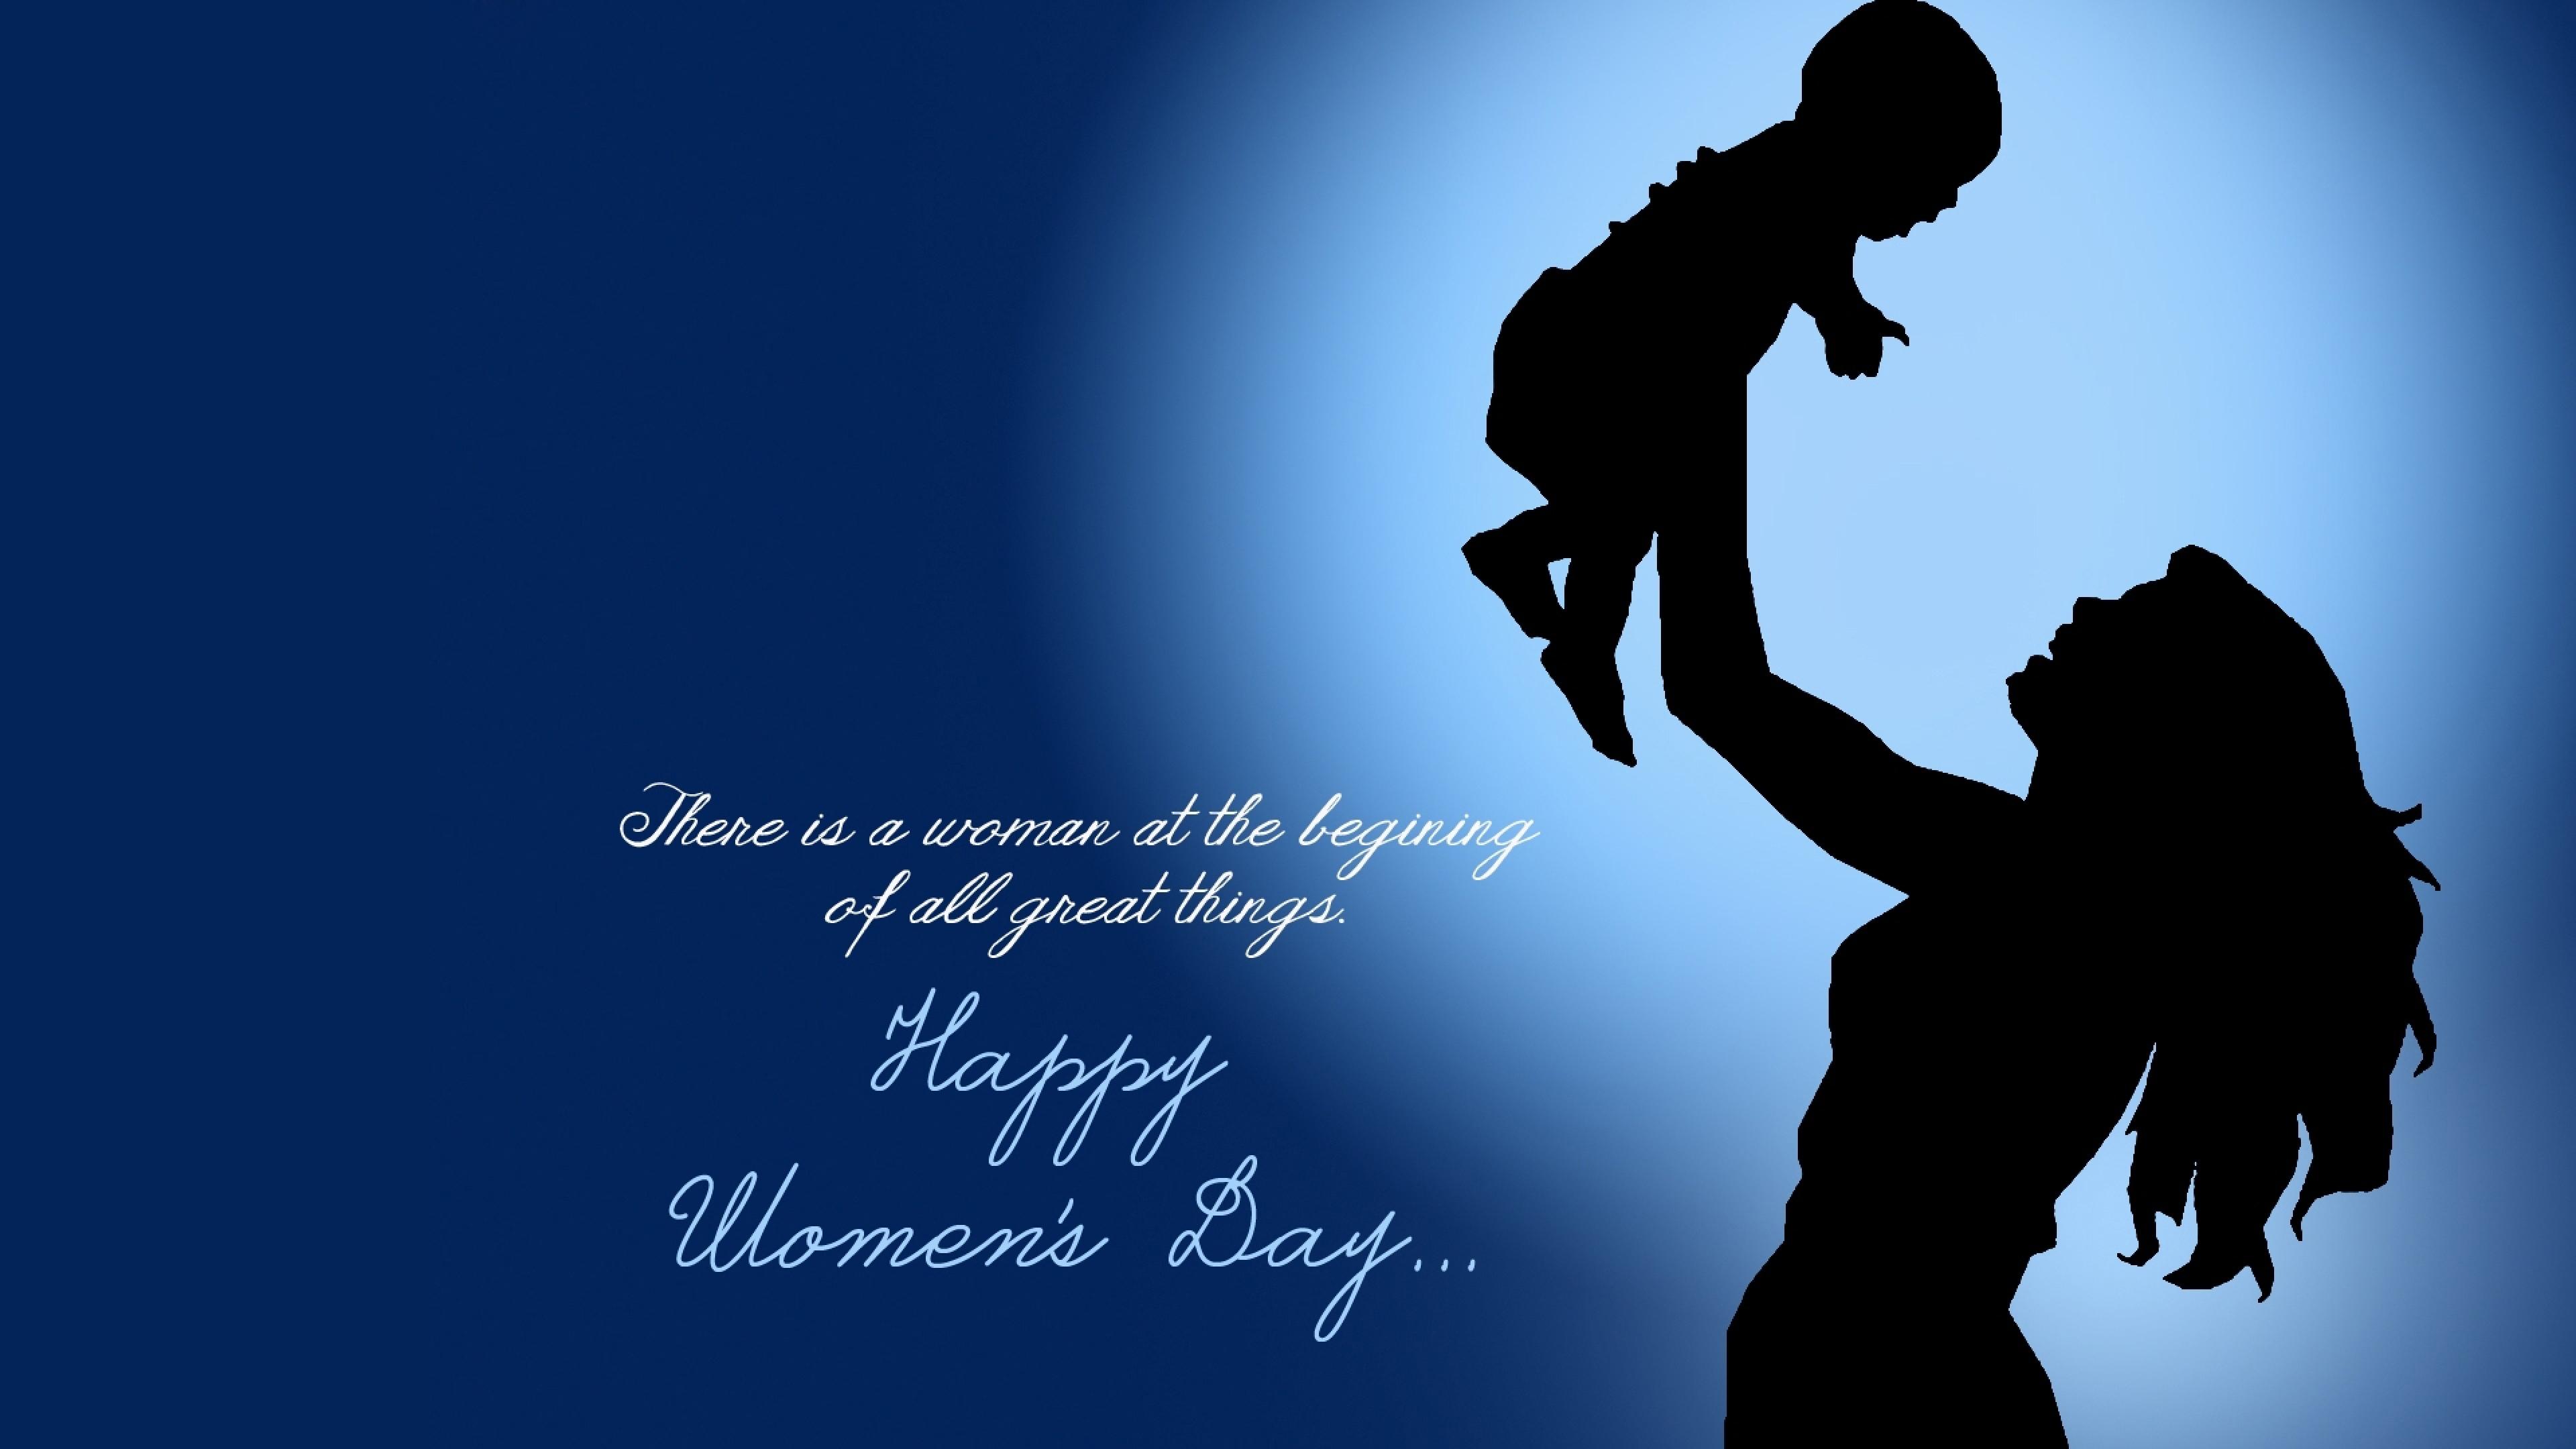 Free Download Womens Day Wallpaper 13 3840 X 2160 Stmednet